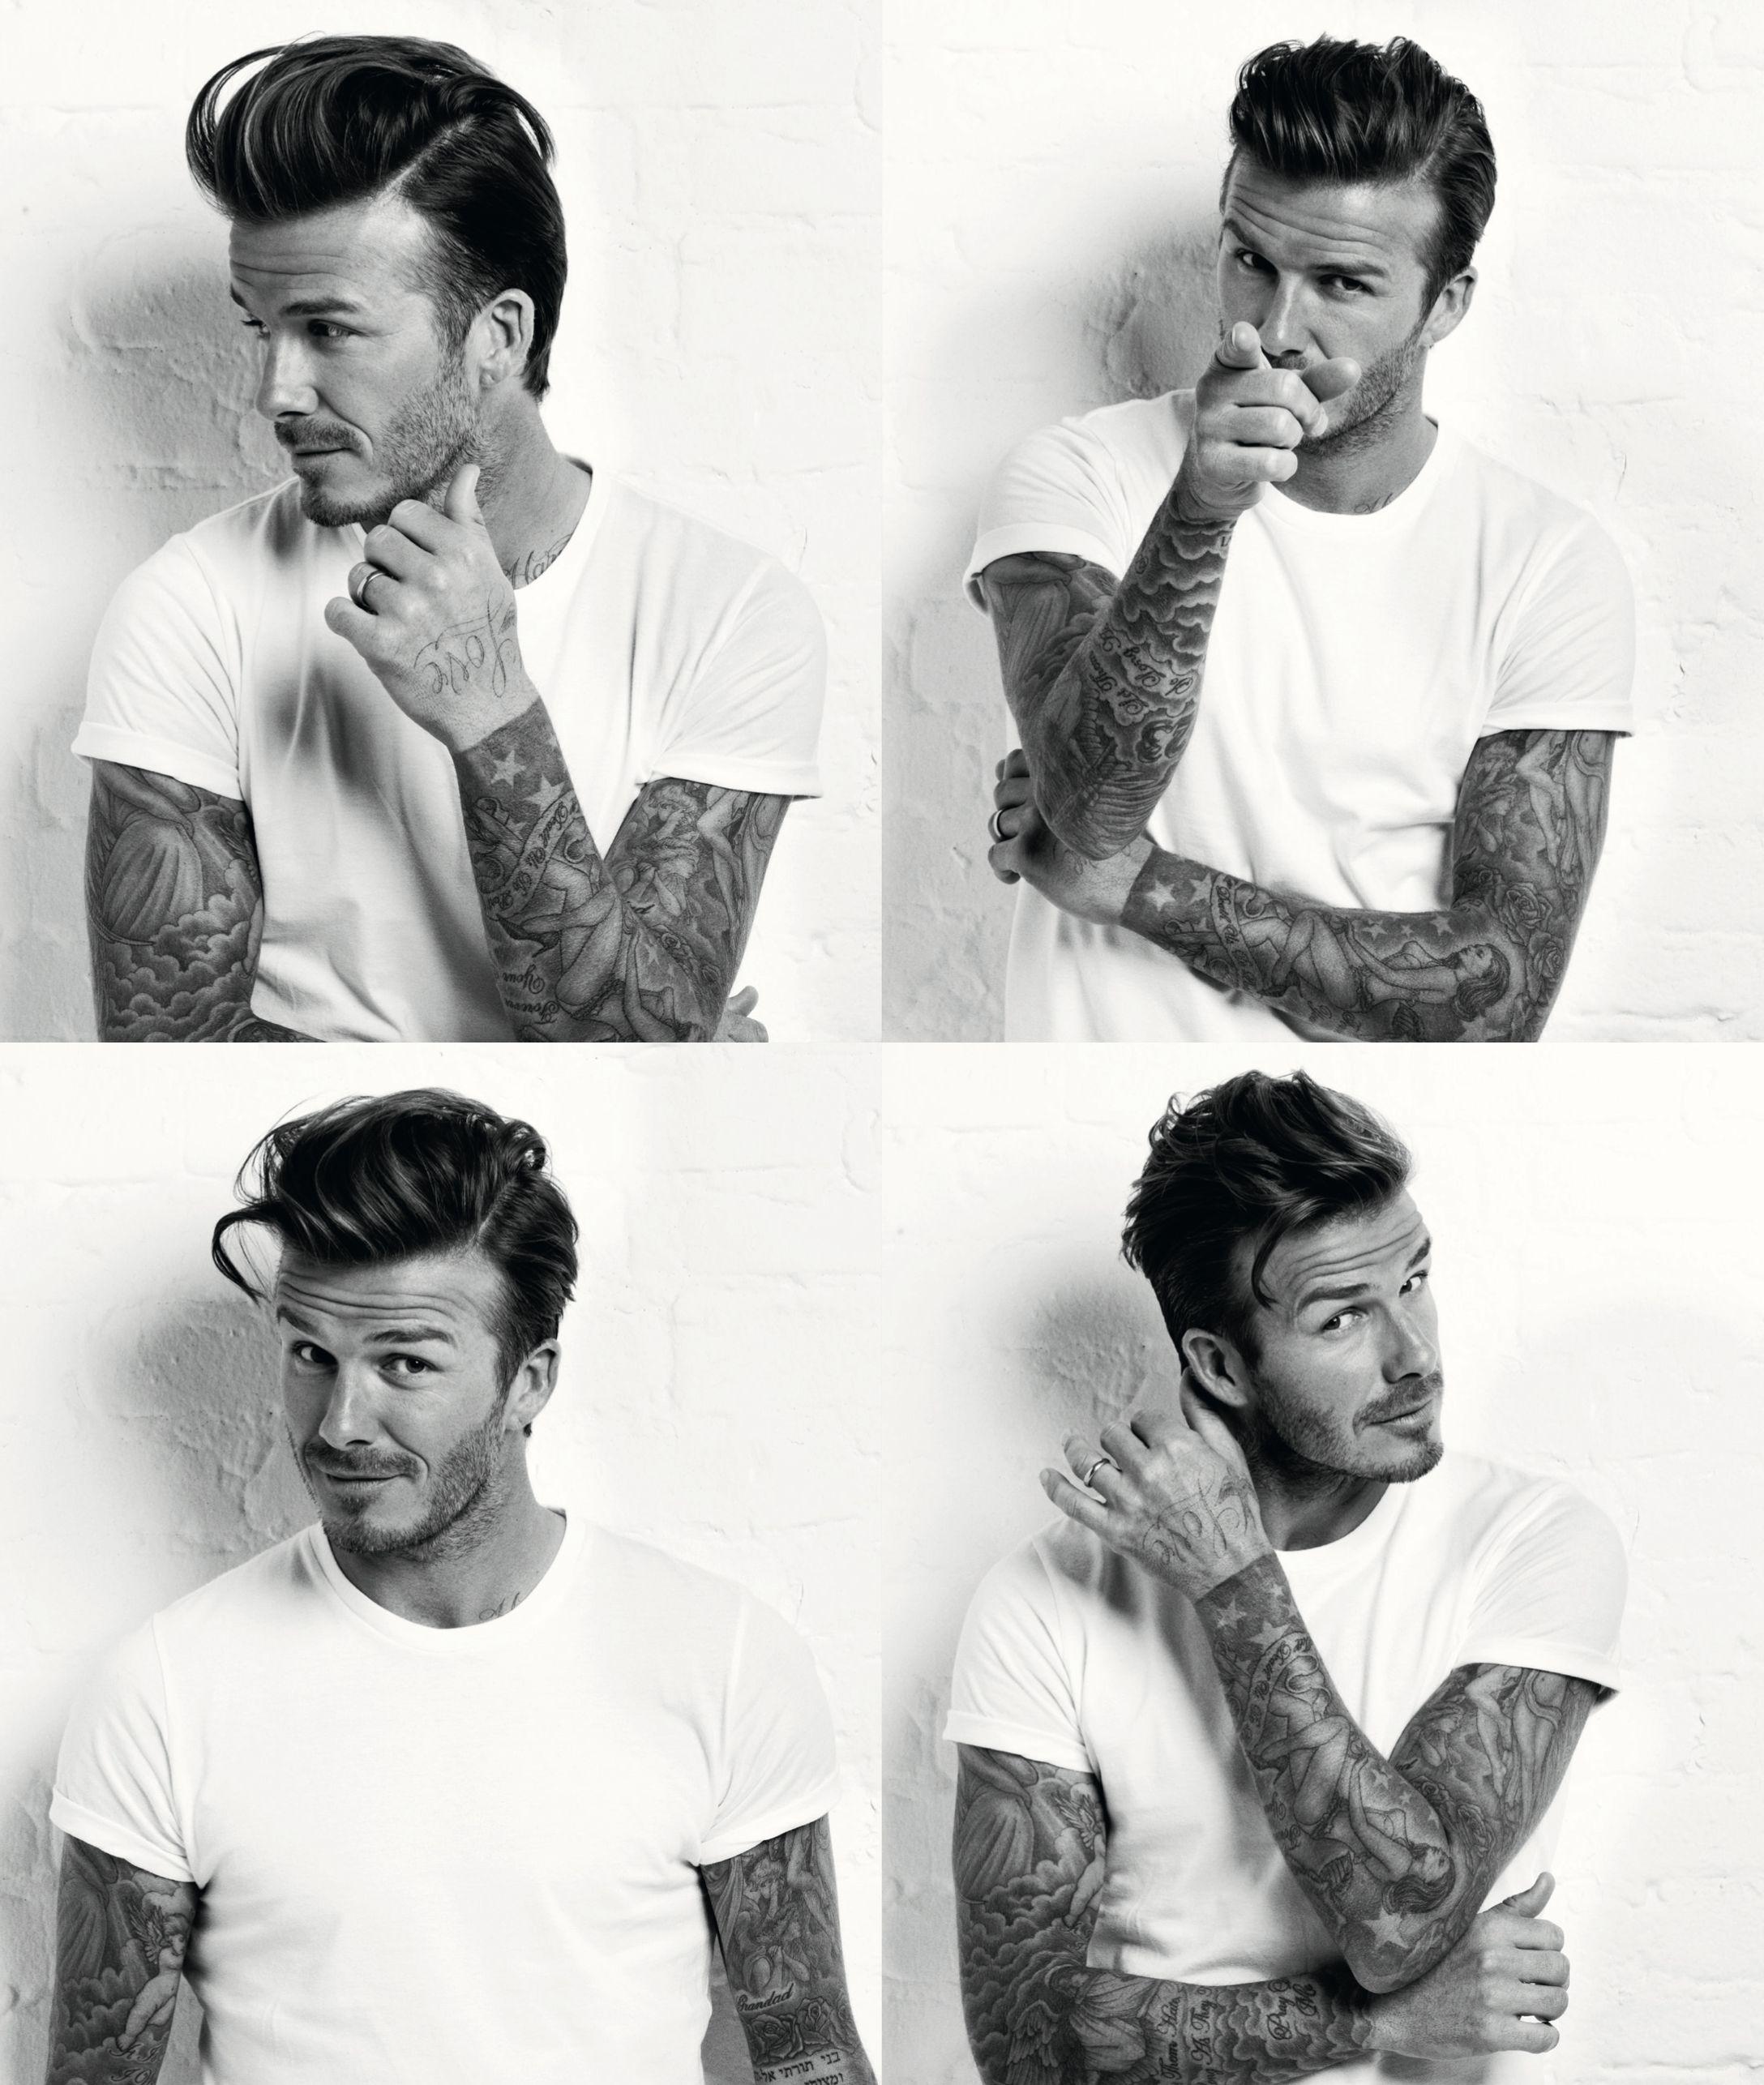 Derek jeter mens hairstyles colton haynes casual hairstyle - David Beckham Men S Health Tattoos And White T Shirt Oh Yeah